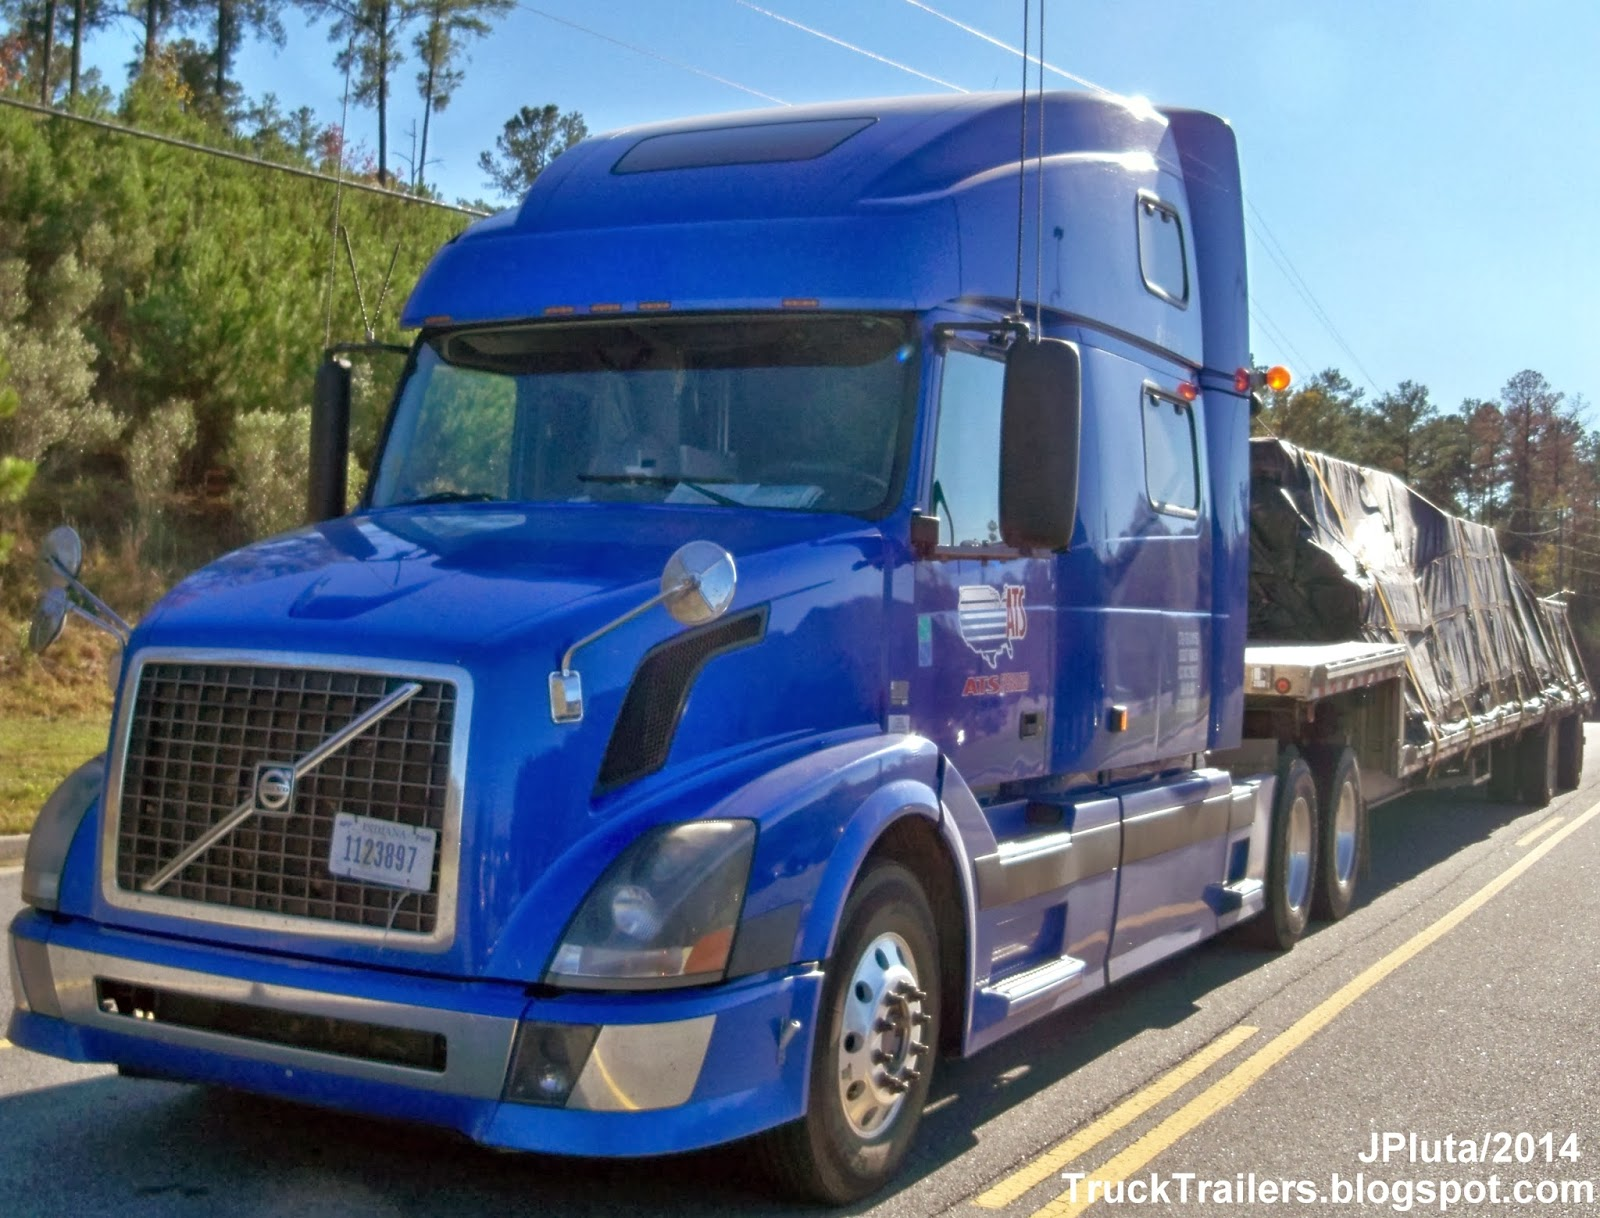 truck trailer transport express freight logistic diesel. Black Bedroom Furniture Sets. Home Design Ideas